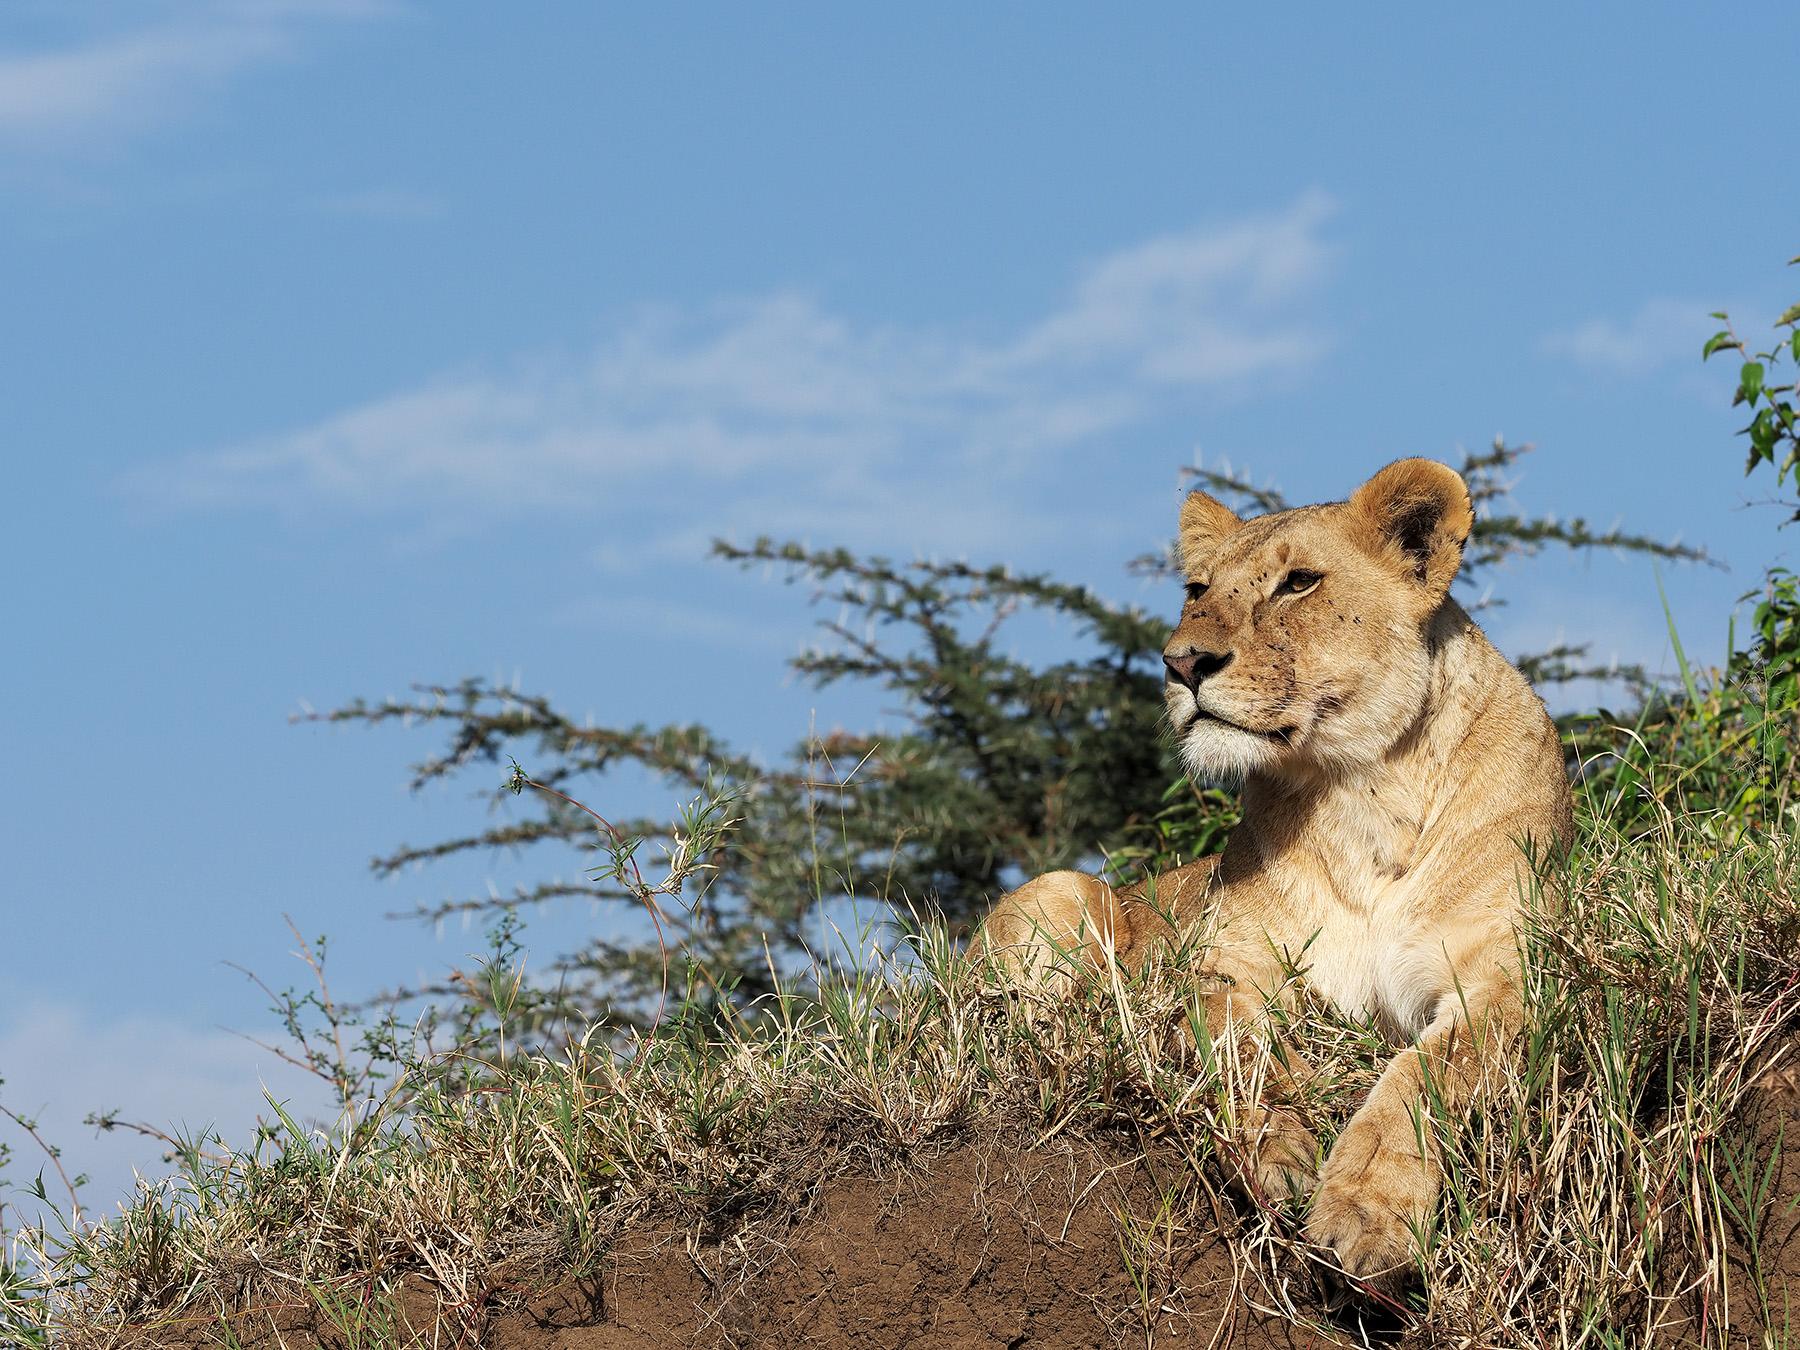 Ranjan_Ramchandani_Lioness looking out.jpg